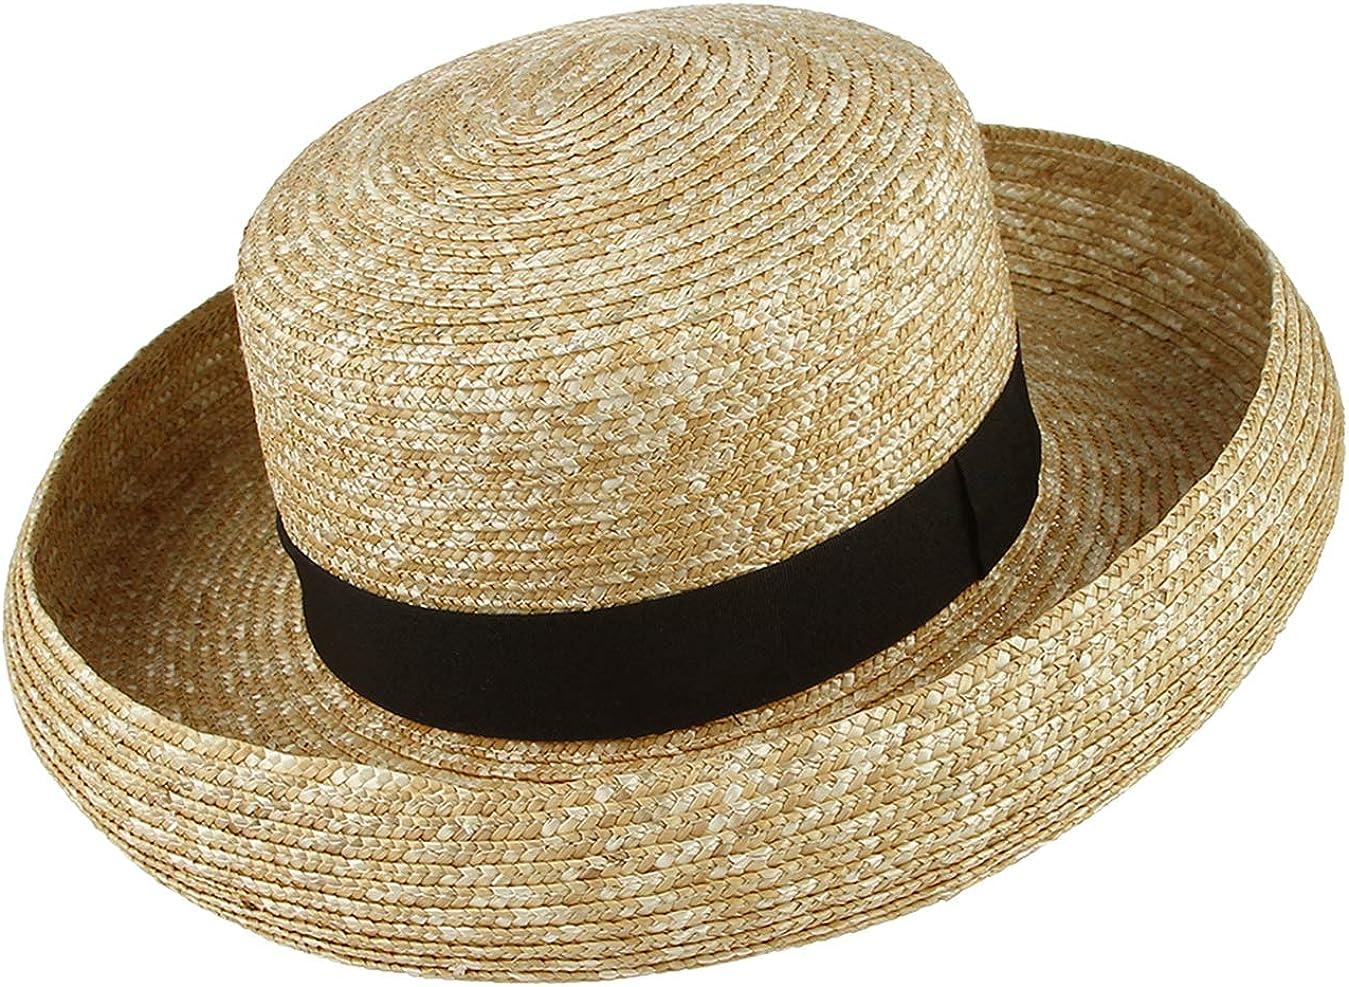 Men's Vintage Style Hats, Retro Hats Jelord Women Vintage Elegant Straw Sun Hat UV Protection Flat Top Roll Rim Panama Boater Hat Beach Sun Hat $15.39 AT vintagedancer.com